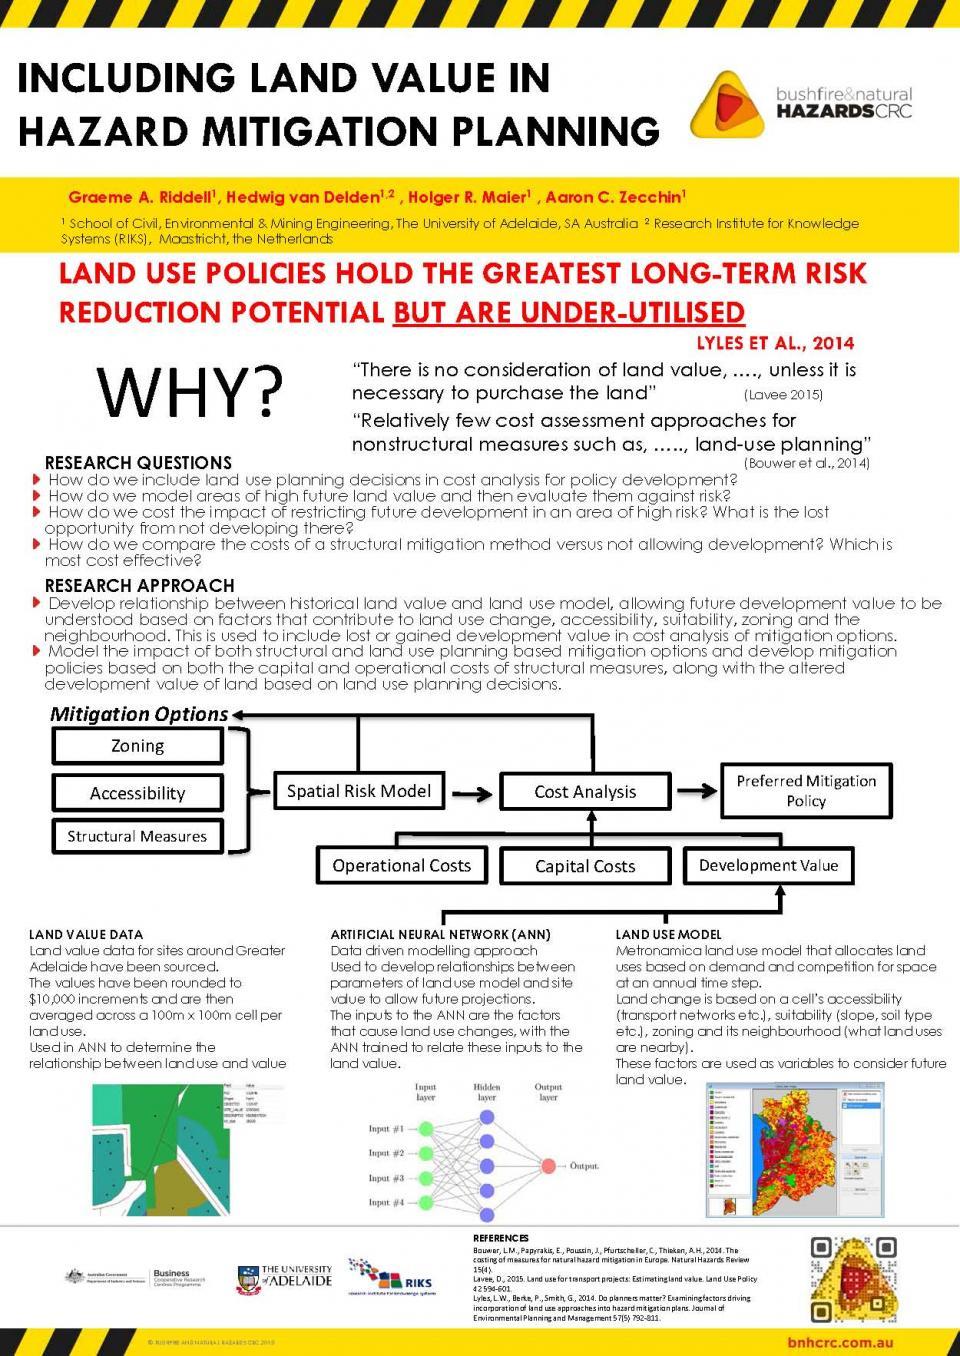 Including Land Value in Hazard Mitigation Planning